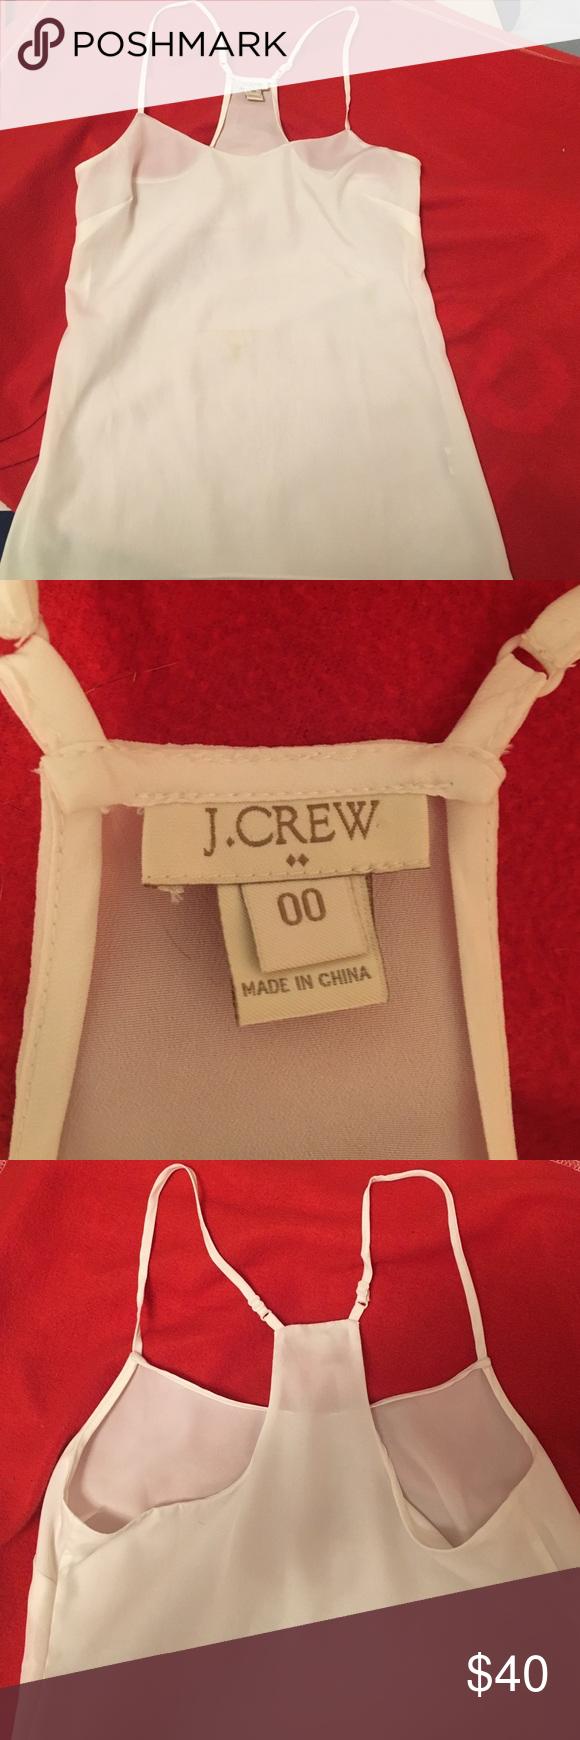 J. Crew tank White chiffon material, slightly sheer. NWOT J. Crew Tops Tank Tops